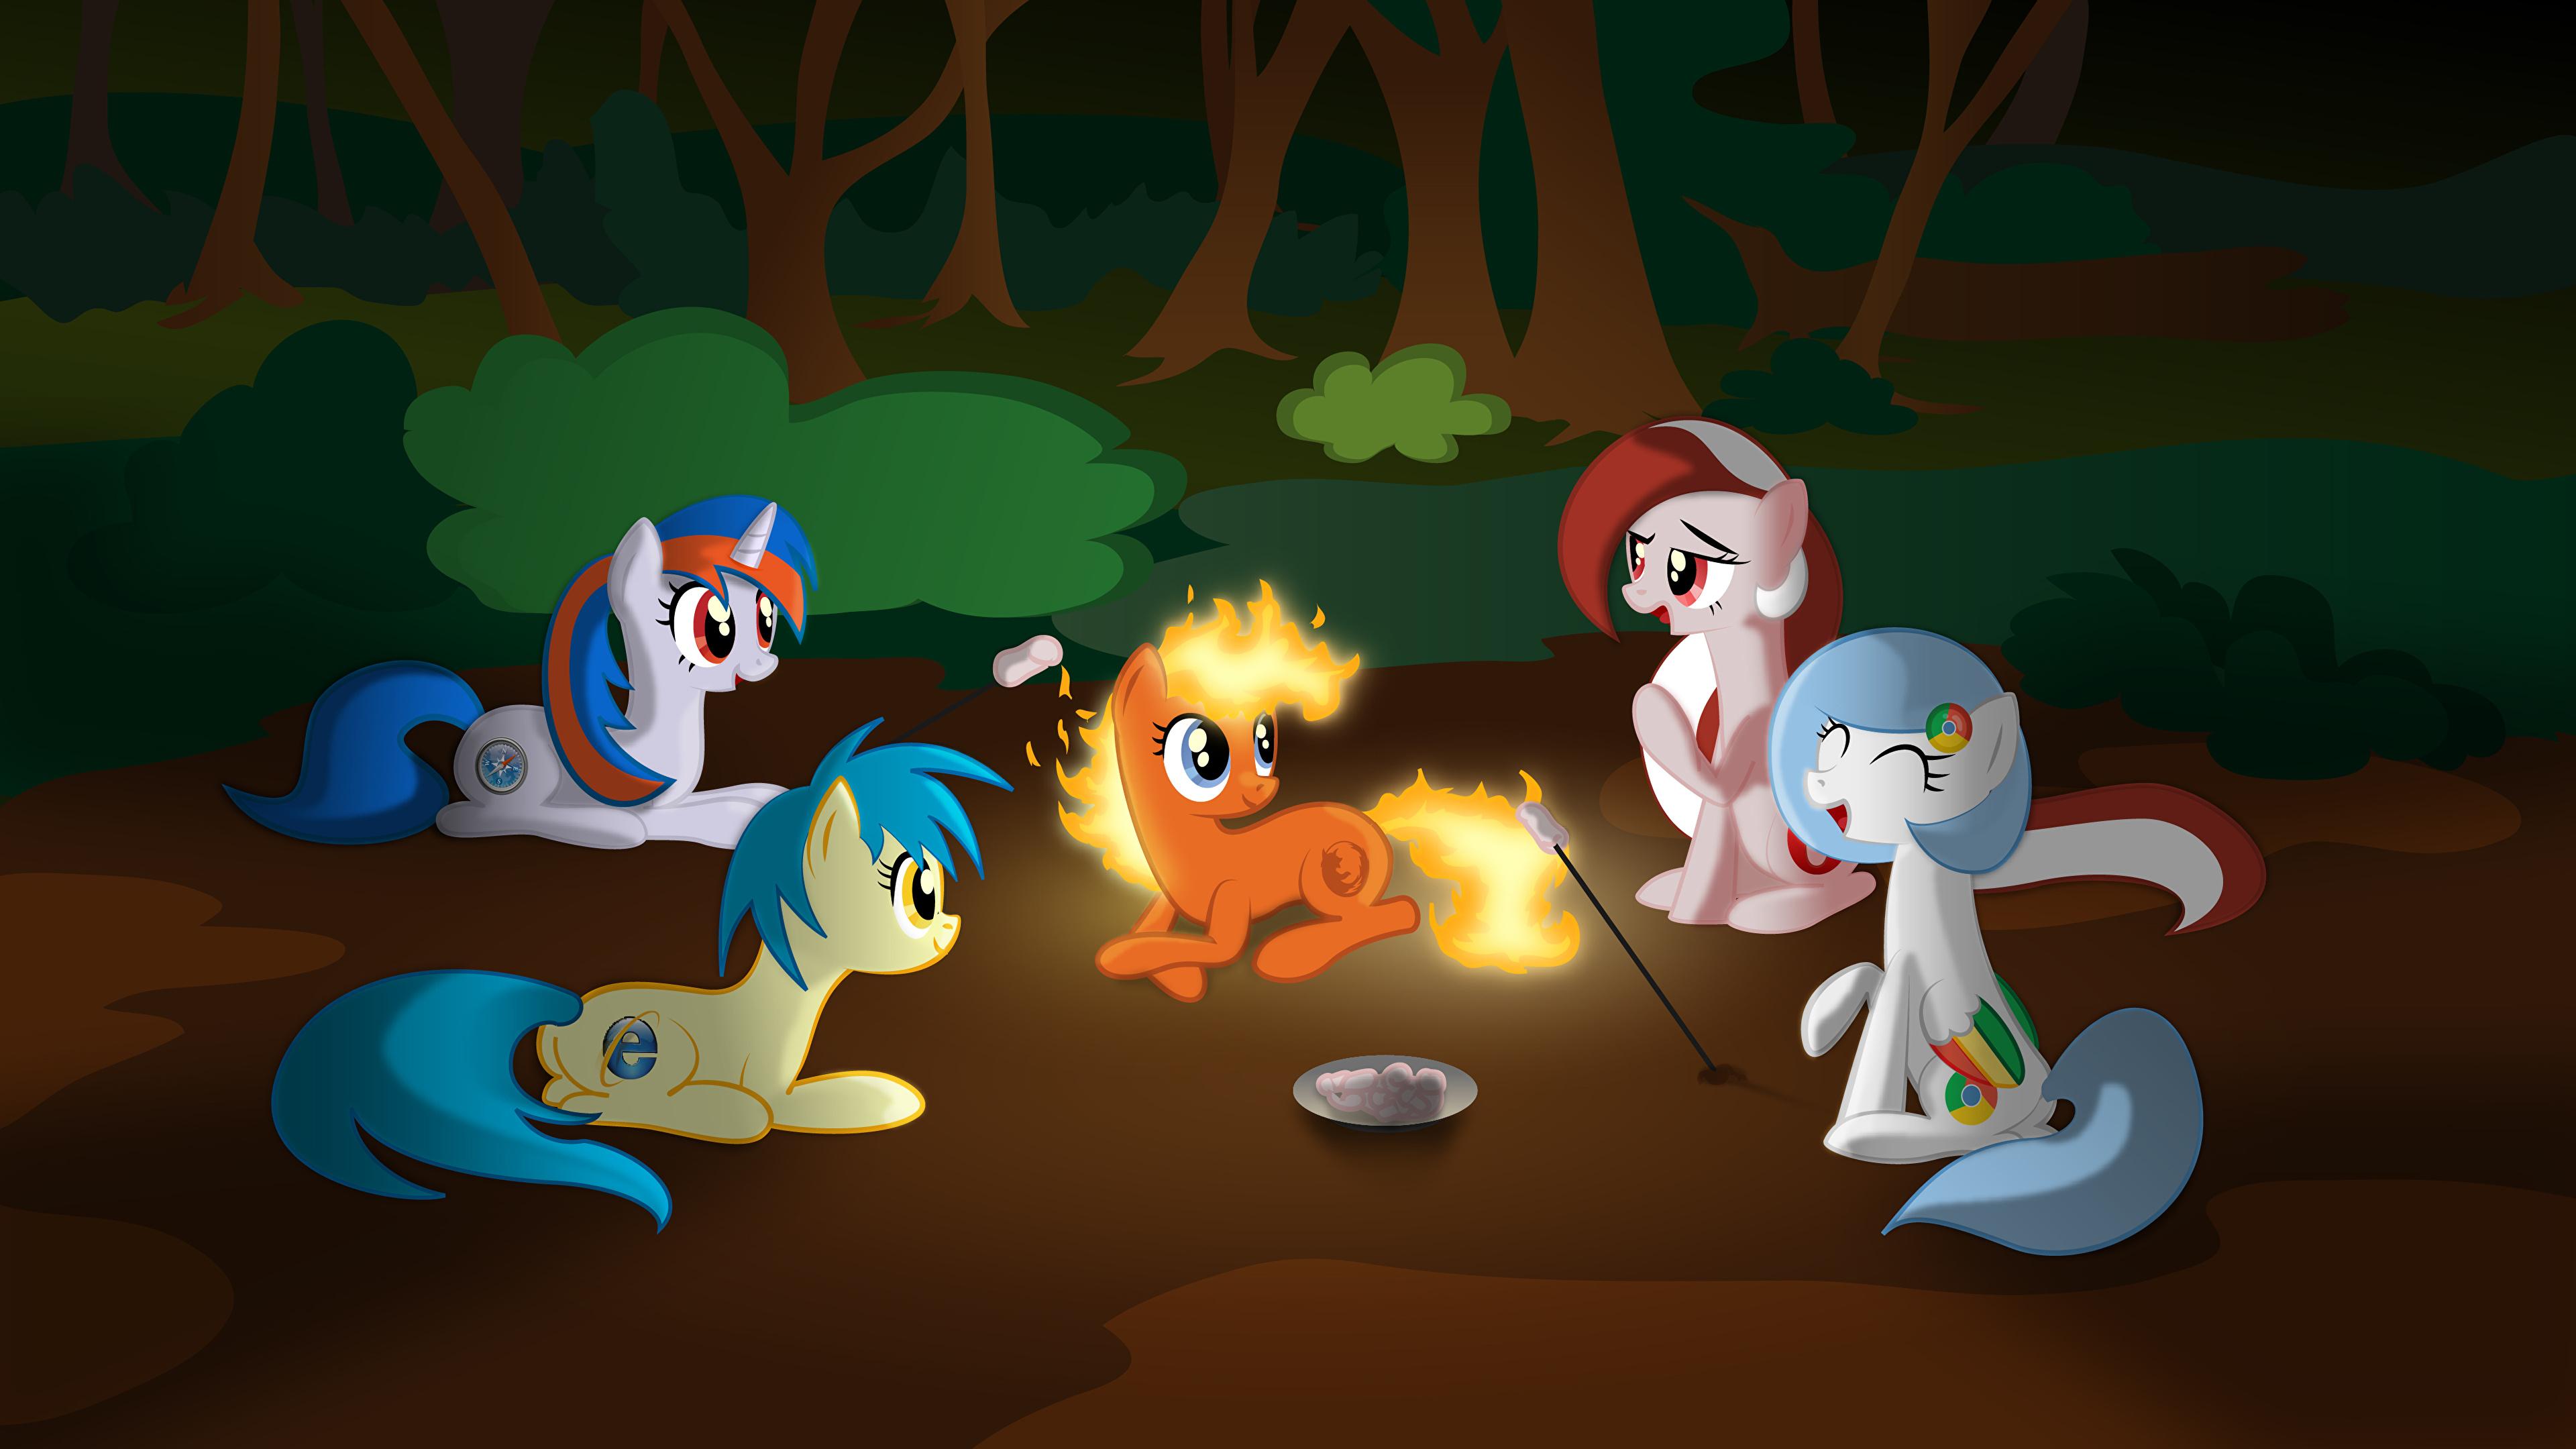 Wallpaper My Little Pony Unicorns Cartoons Fire 3840x2160